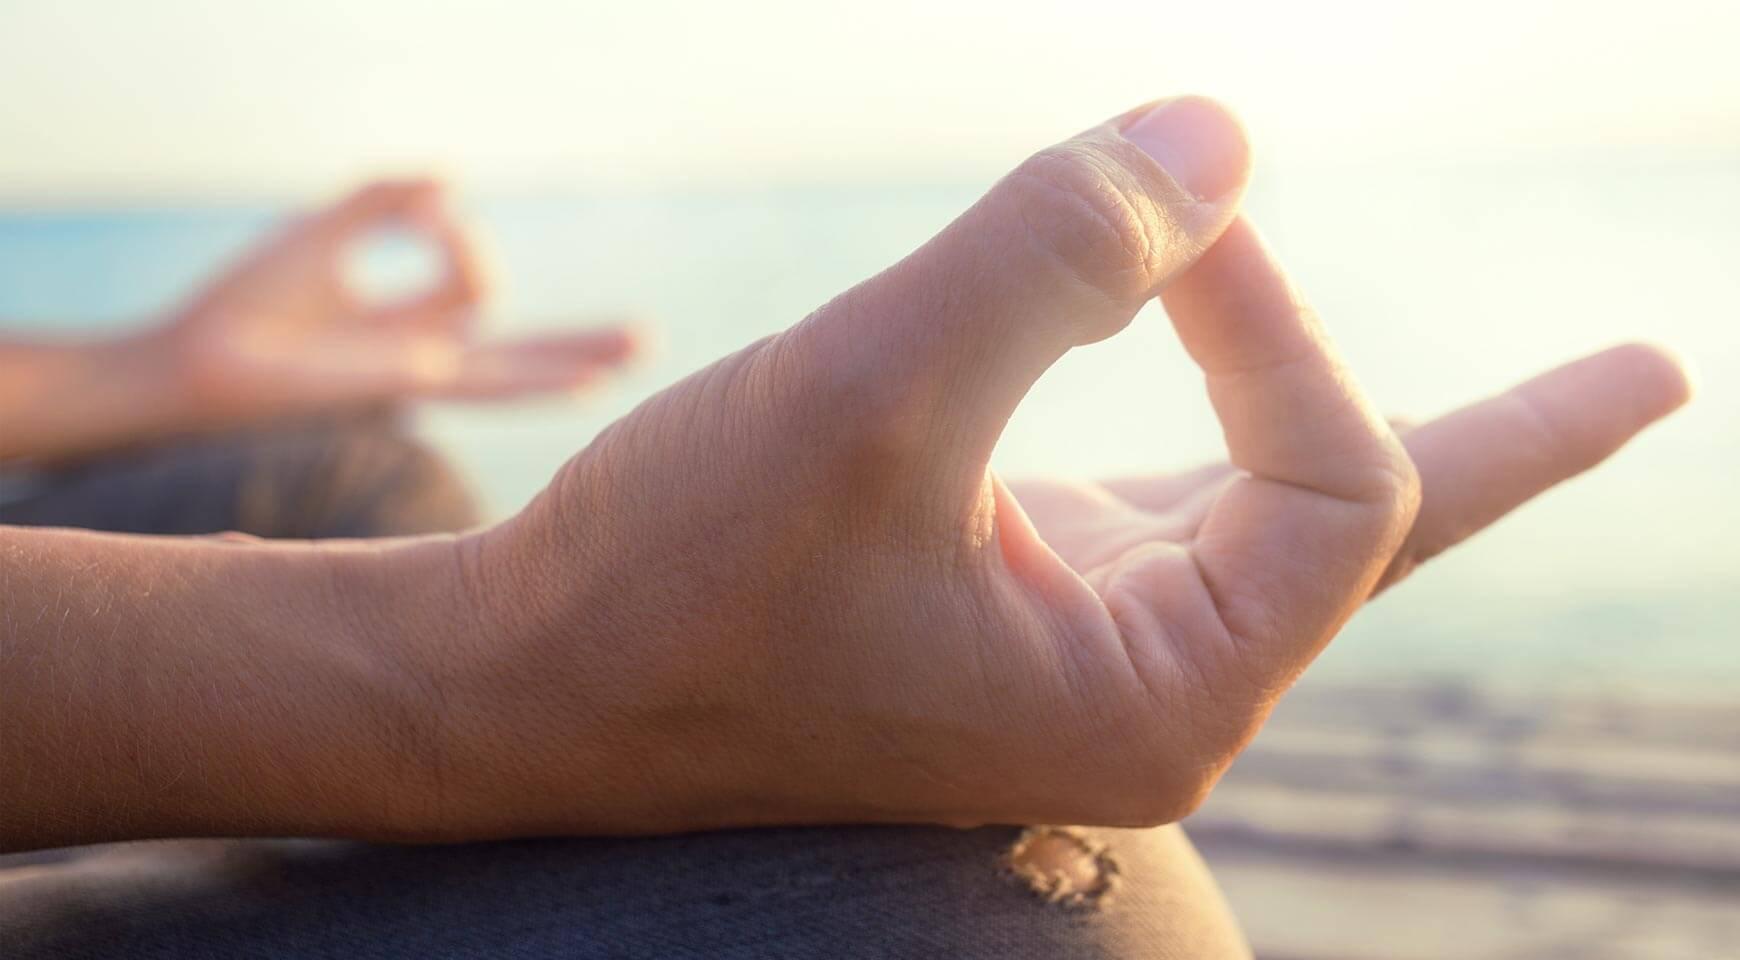 New hope for rheumatoid arthritis sufferers